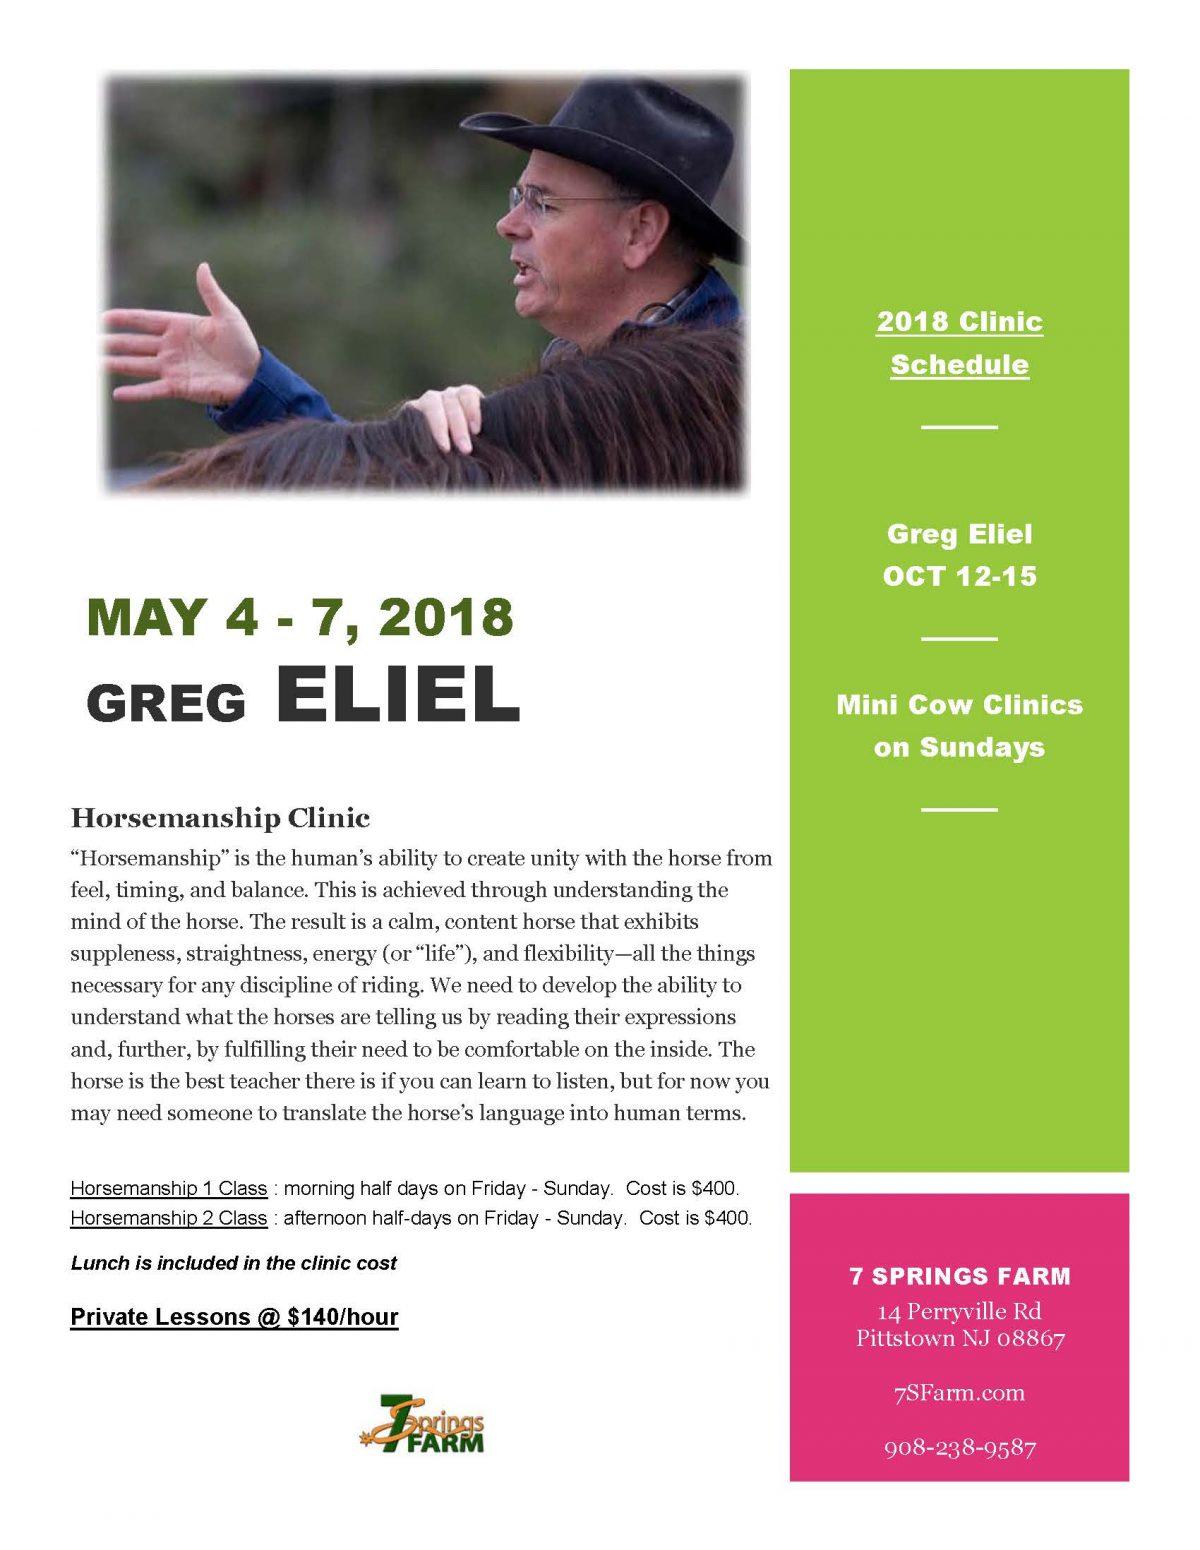 7 Springs Farm Flyer (2018-05-04 - Greg Eliel Clinic)